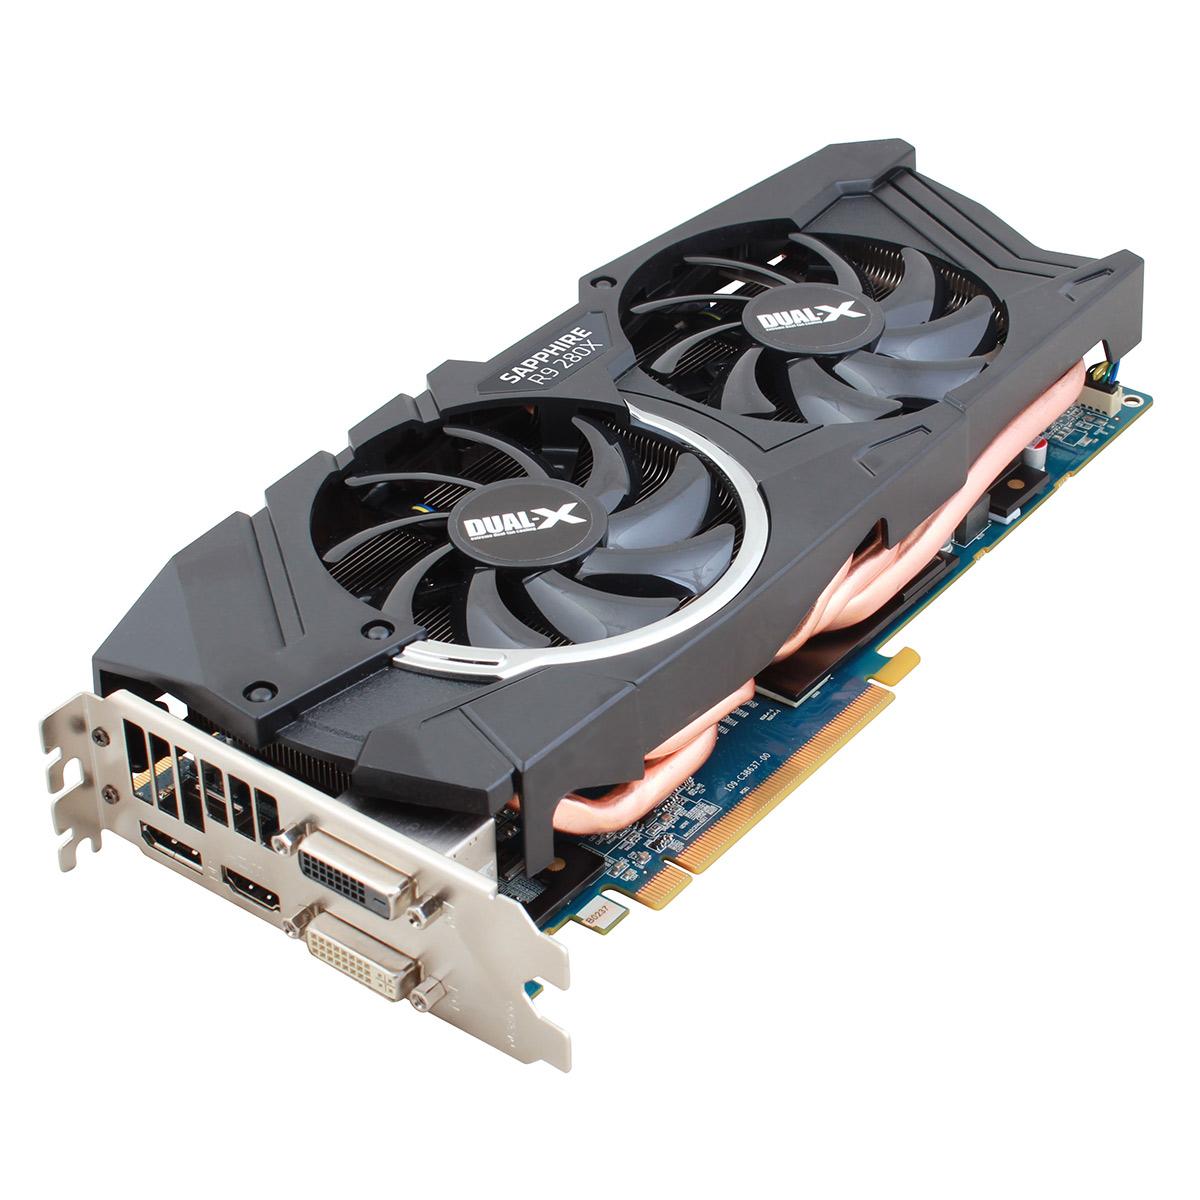 Carte graphique Sapphire Radeon R9 280X 3G GDDR5 Lite RF 3 Go Dual DVI/HDMI/DisplayPort - PCI Express (AMD Radeon R9 280X) - (Produit reconditionné - Etat neuf - Garantie 1 an)